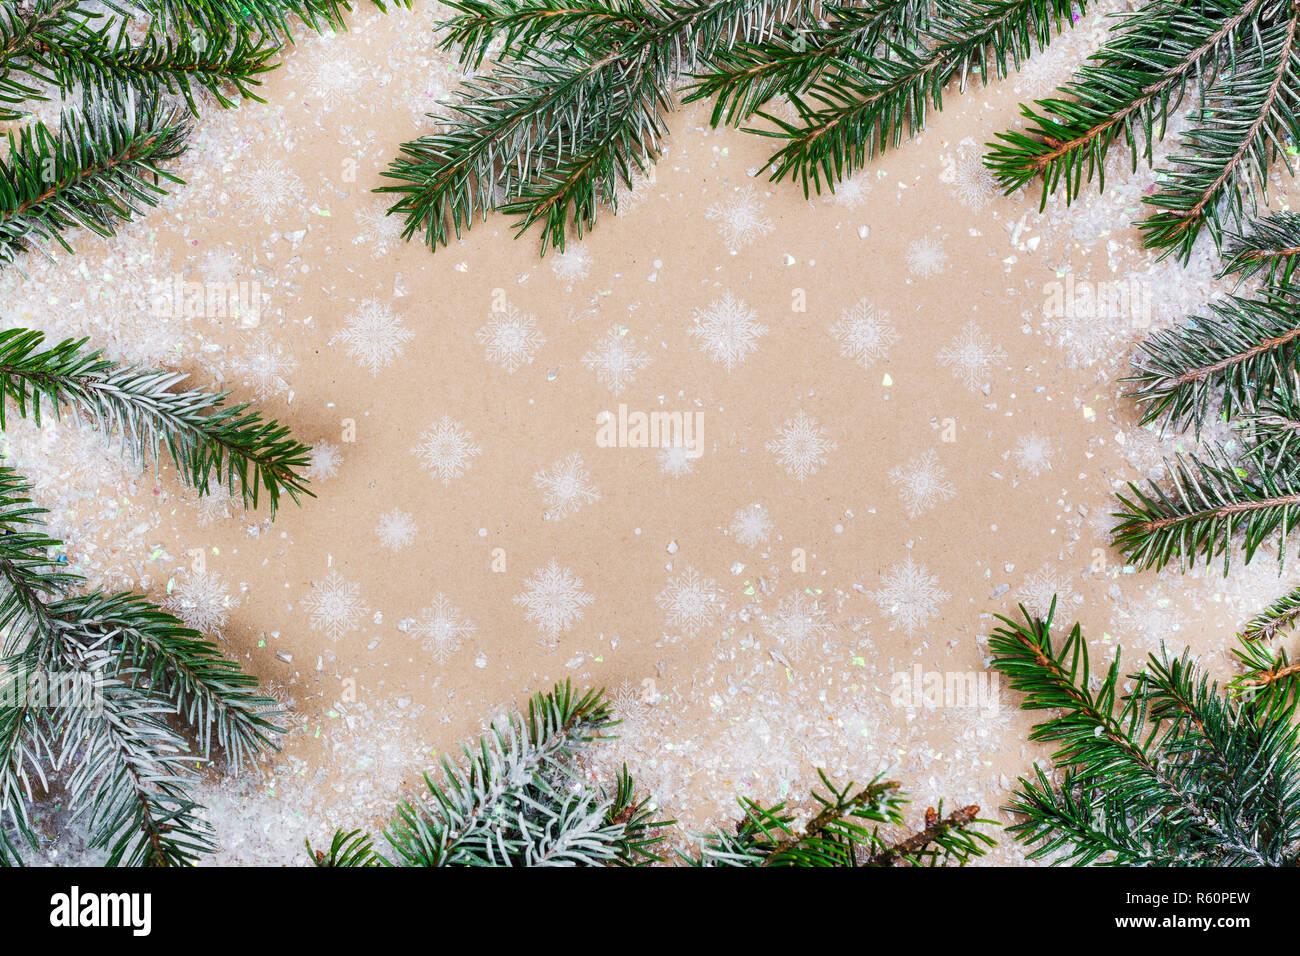 Winter holiday background - Stock Image